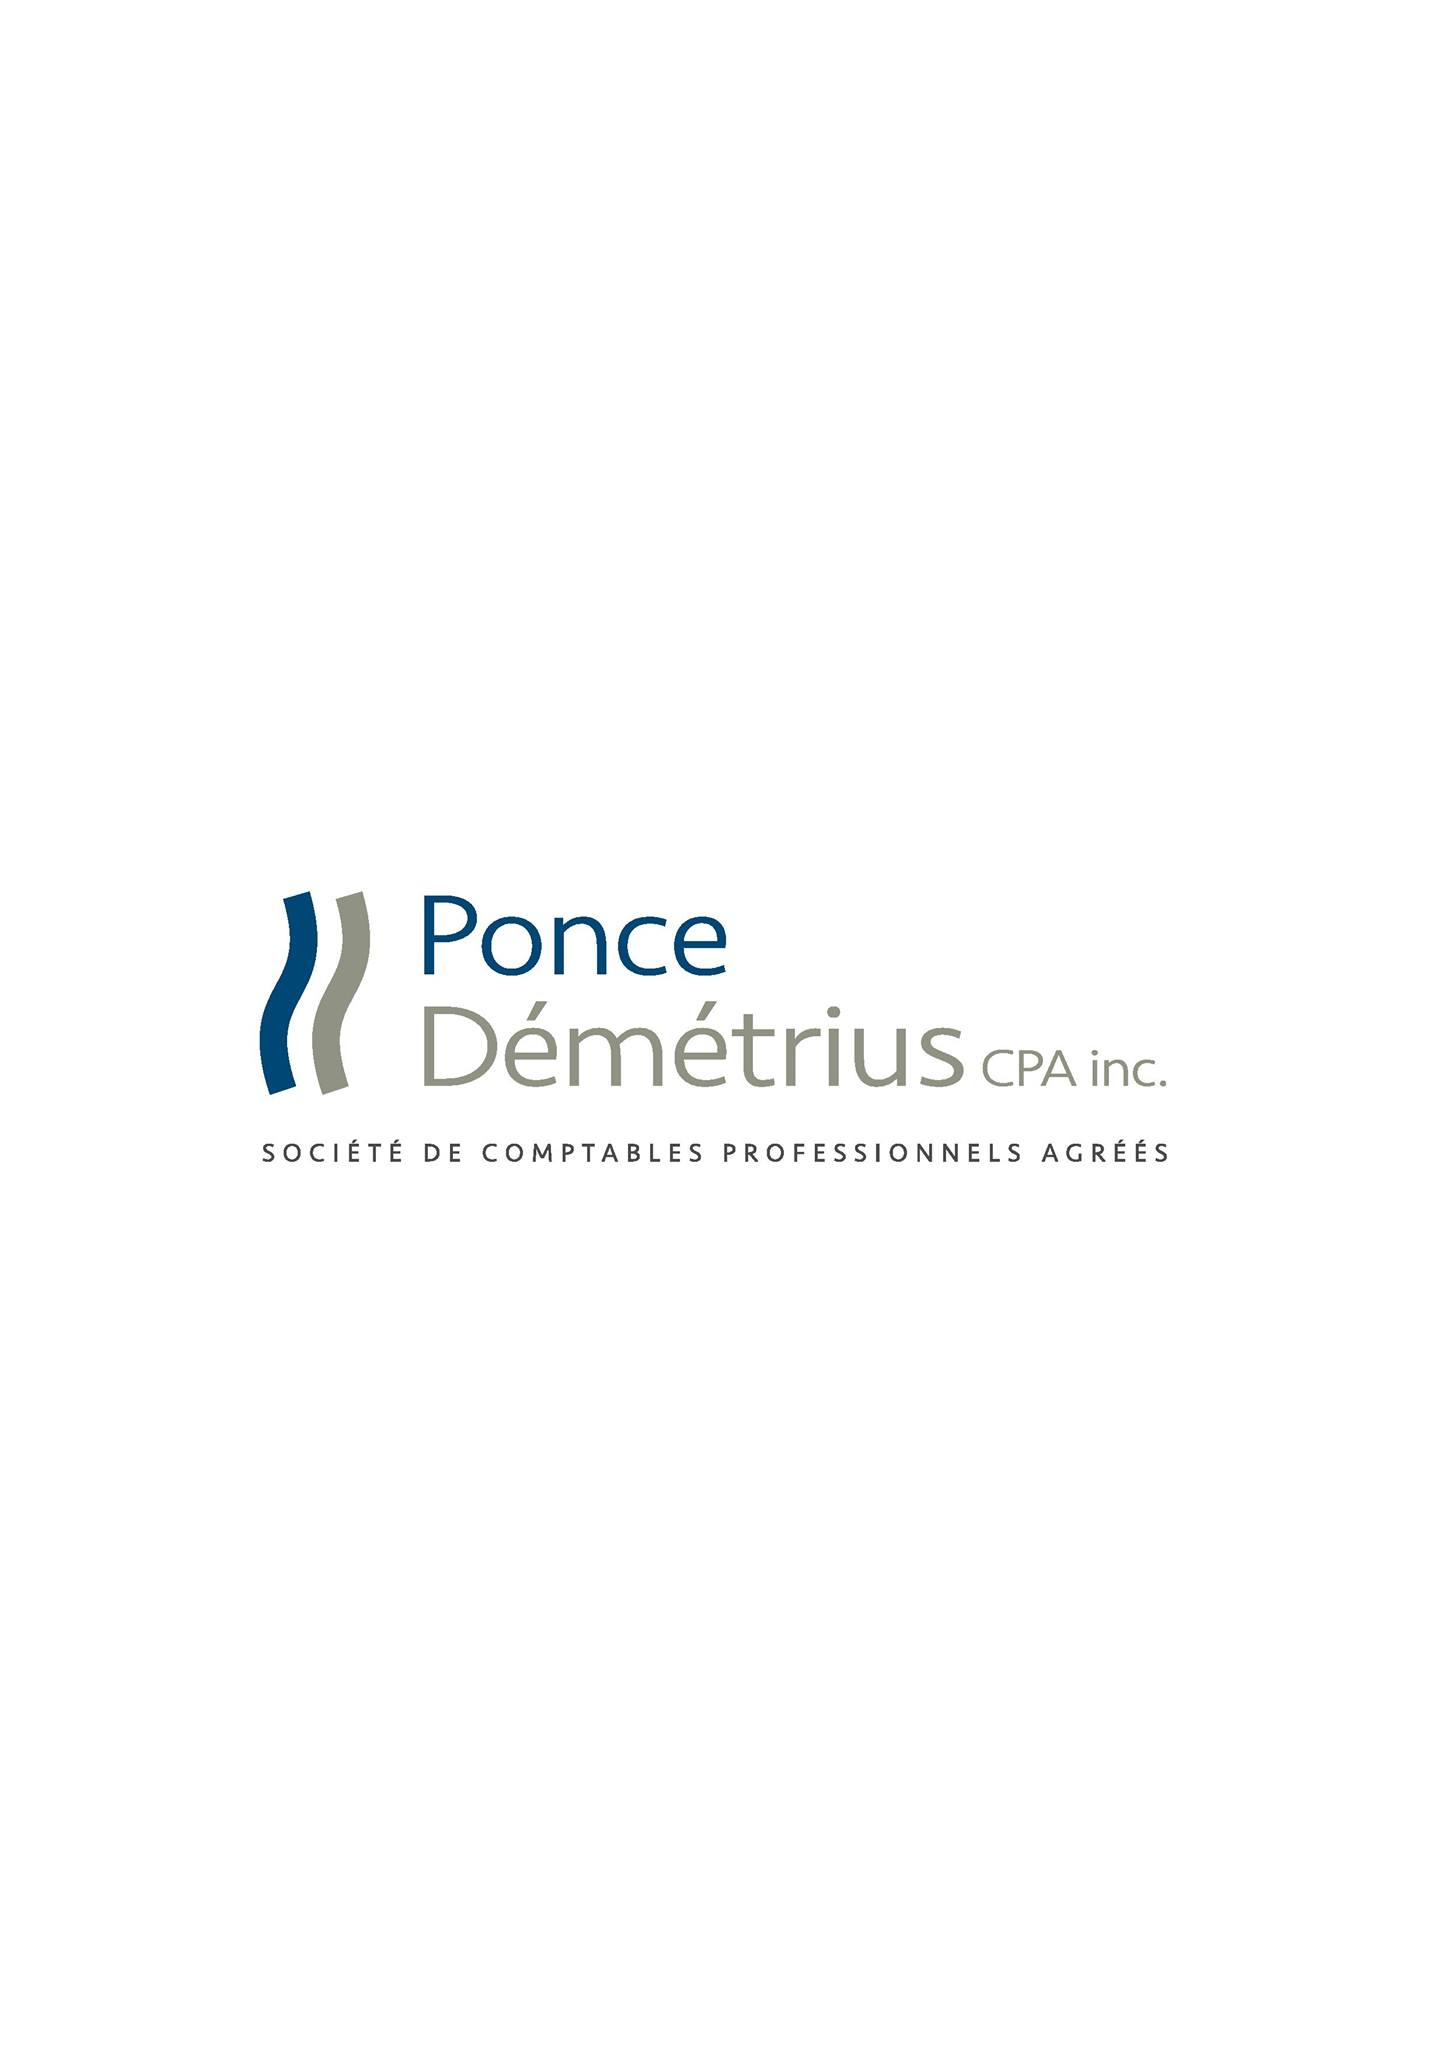 PONCE DEMETRIUS CPA INC - SOSprof SOSteacher